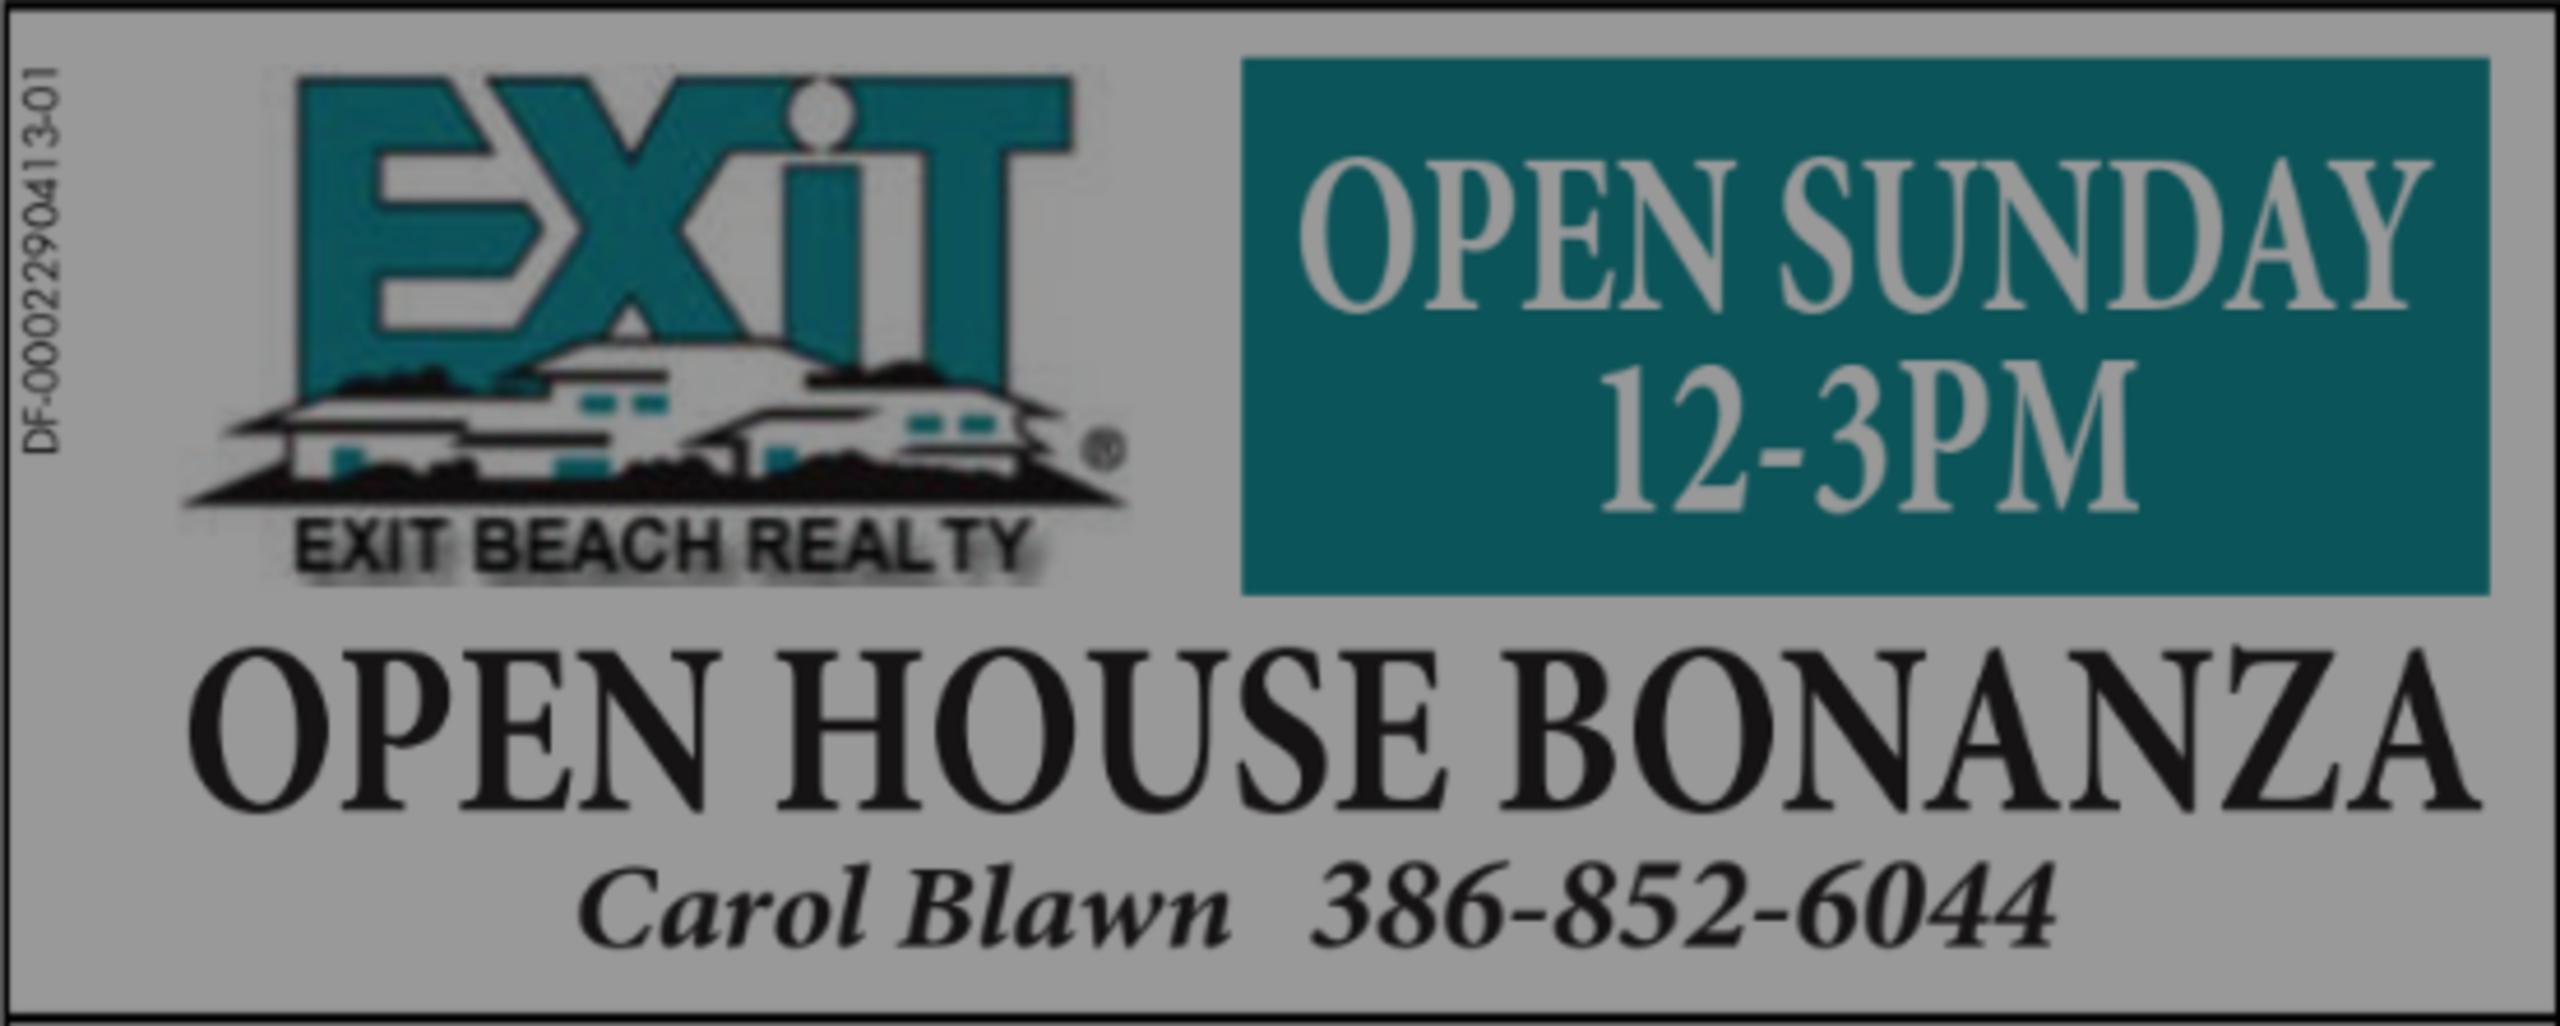 EXIT Beach Realty's Open House Bonanza